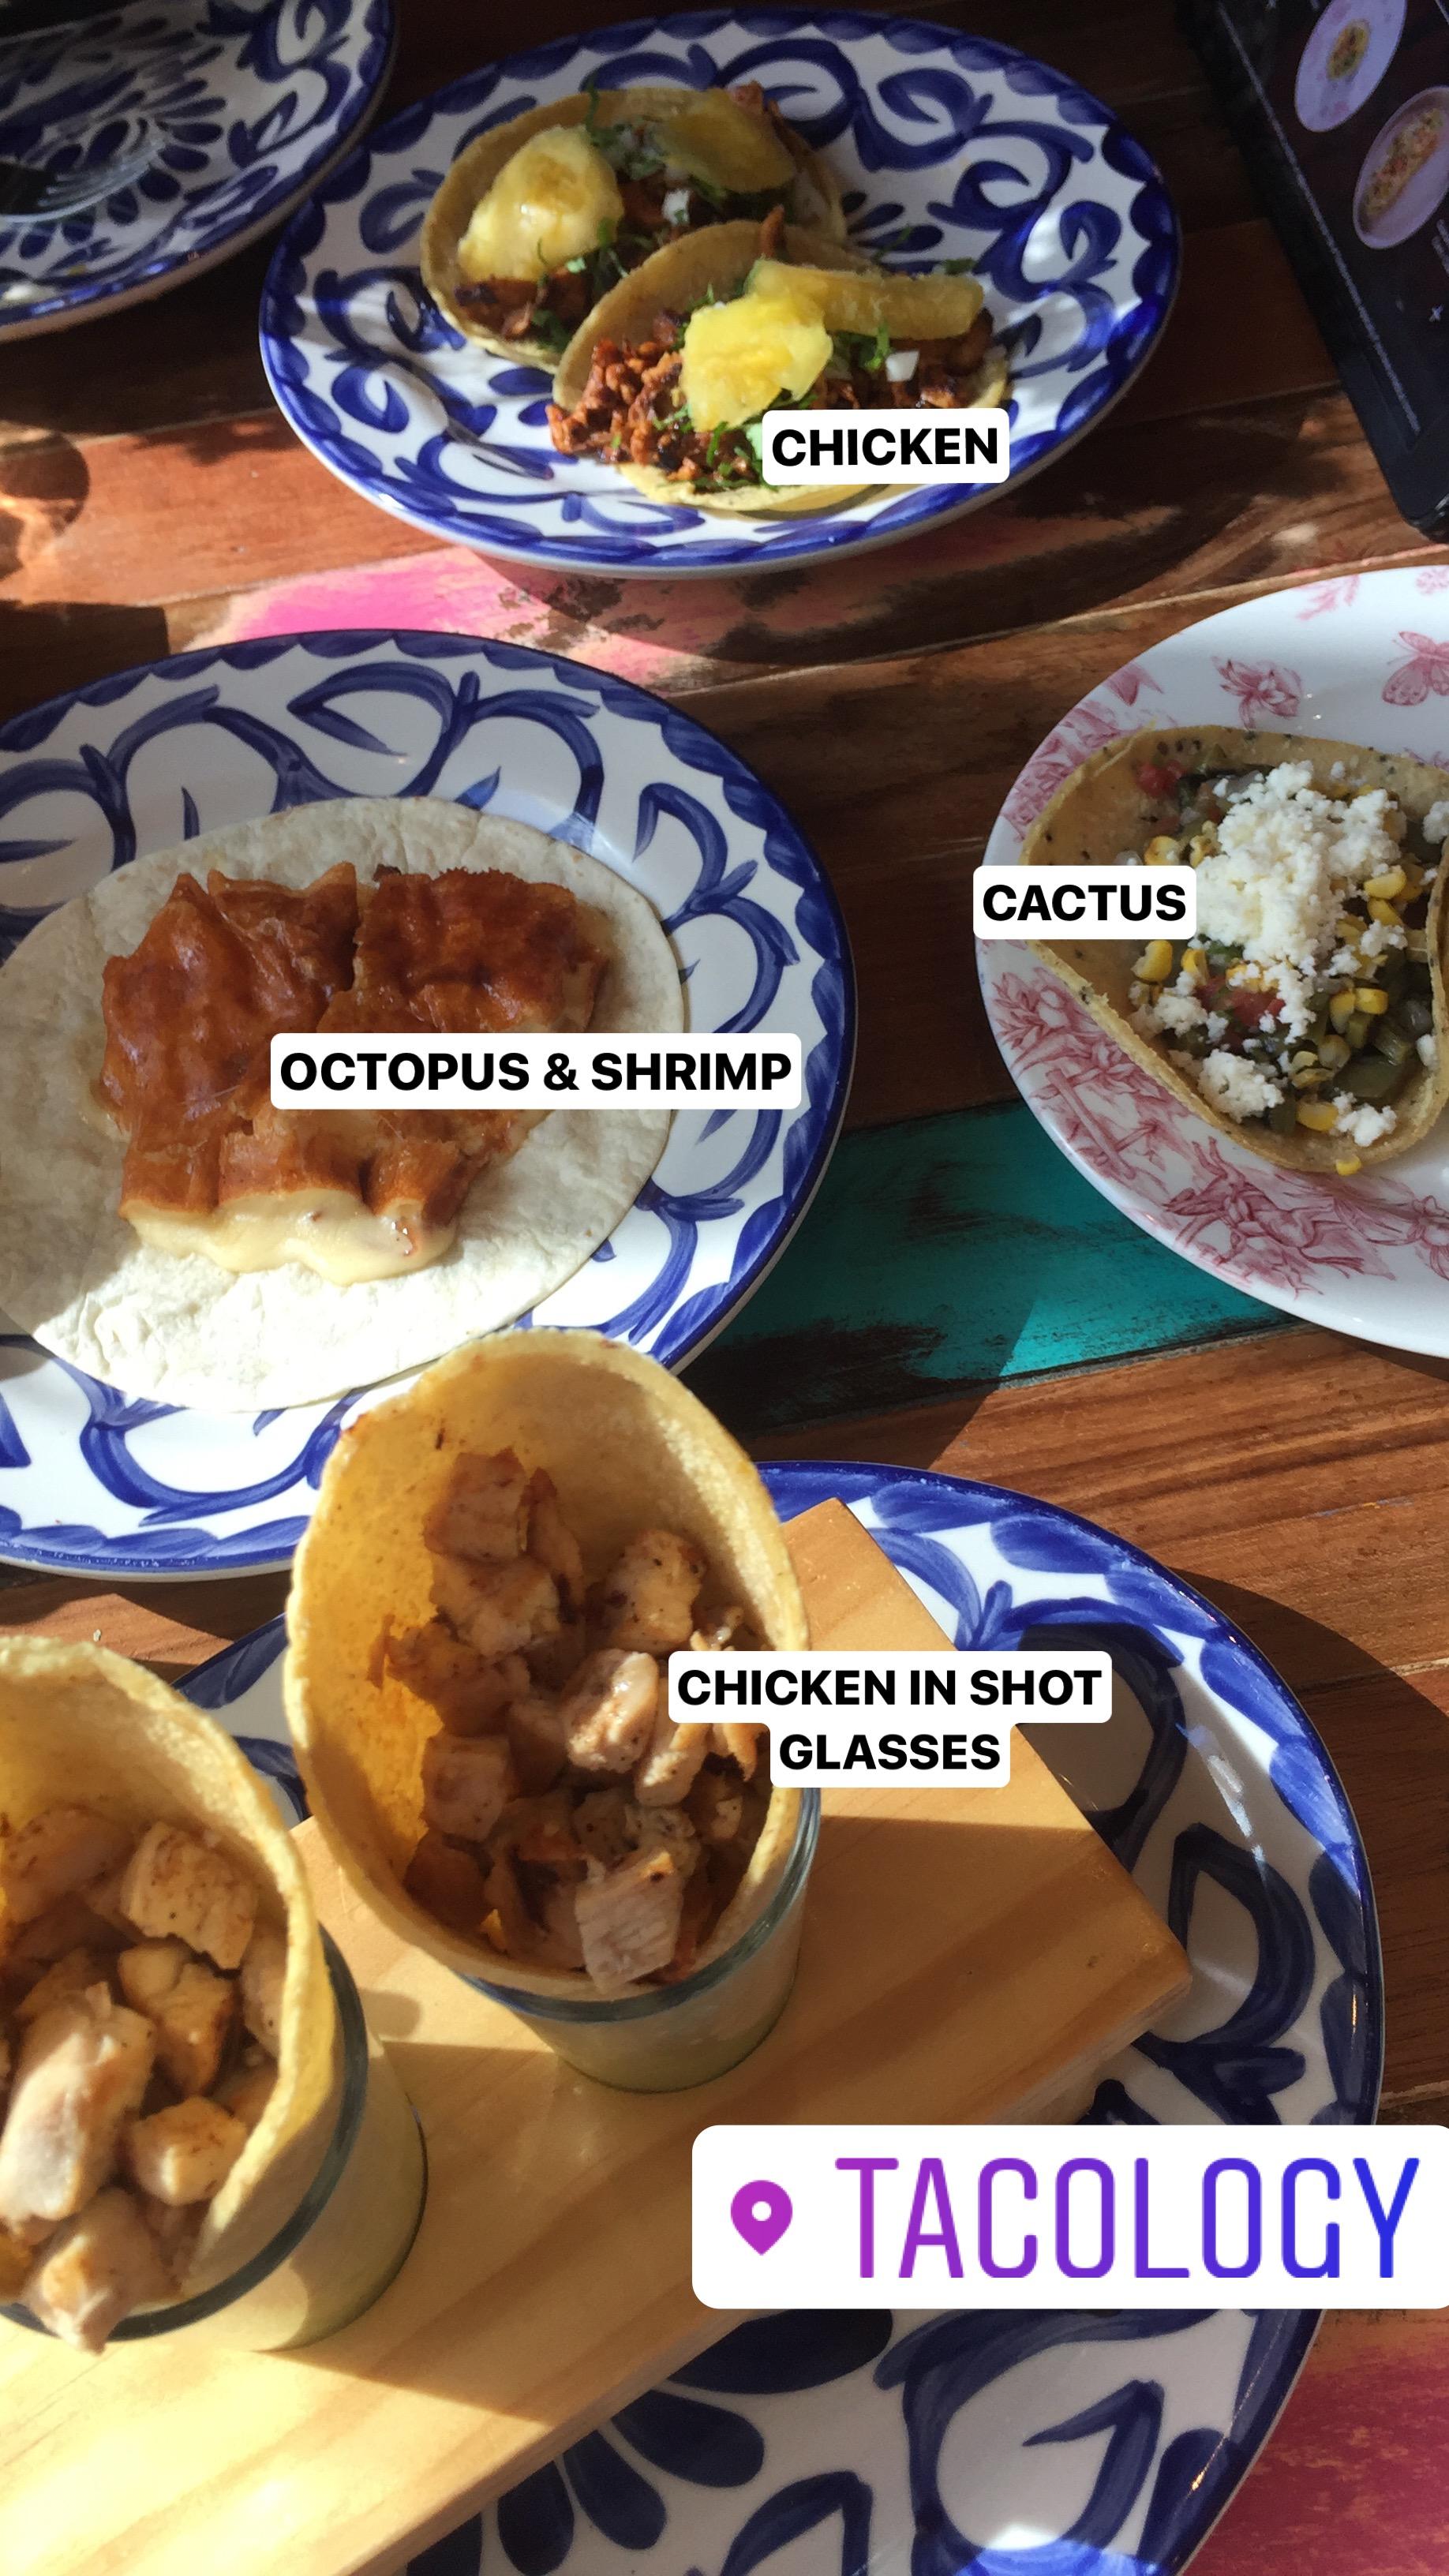 Tacology - Cactus taco, anyone?